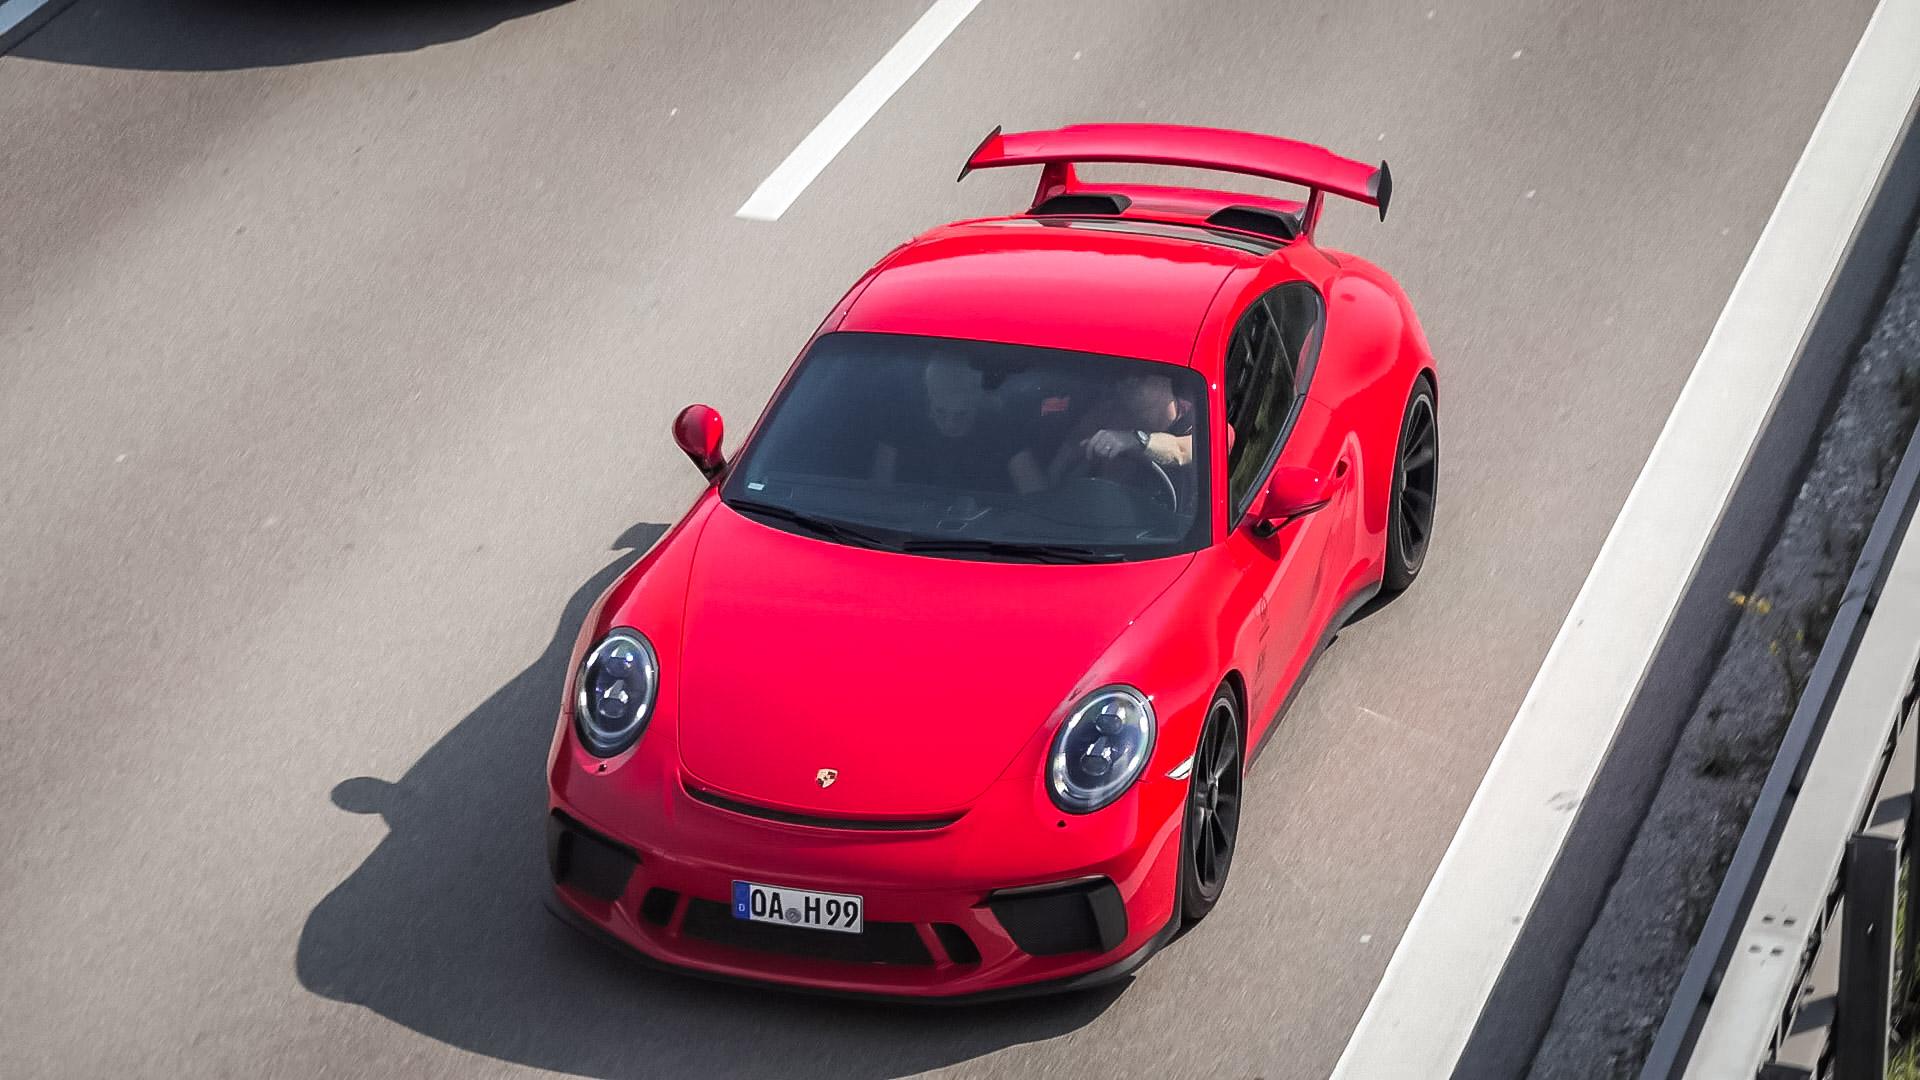 Porsche 991 GT3 - OA-H-99